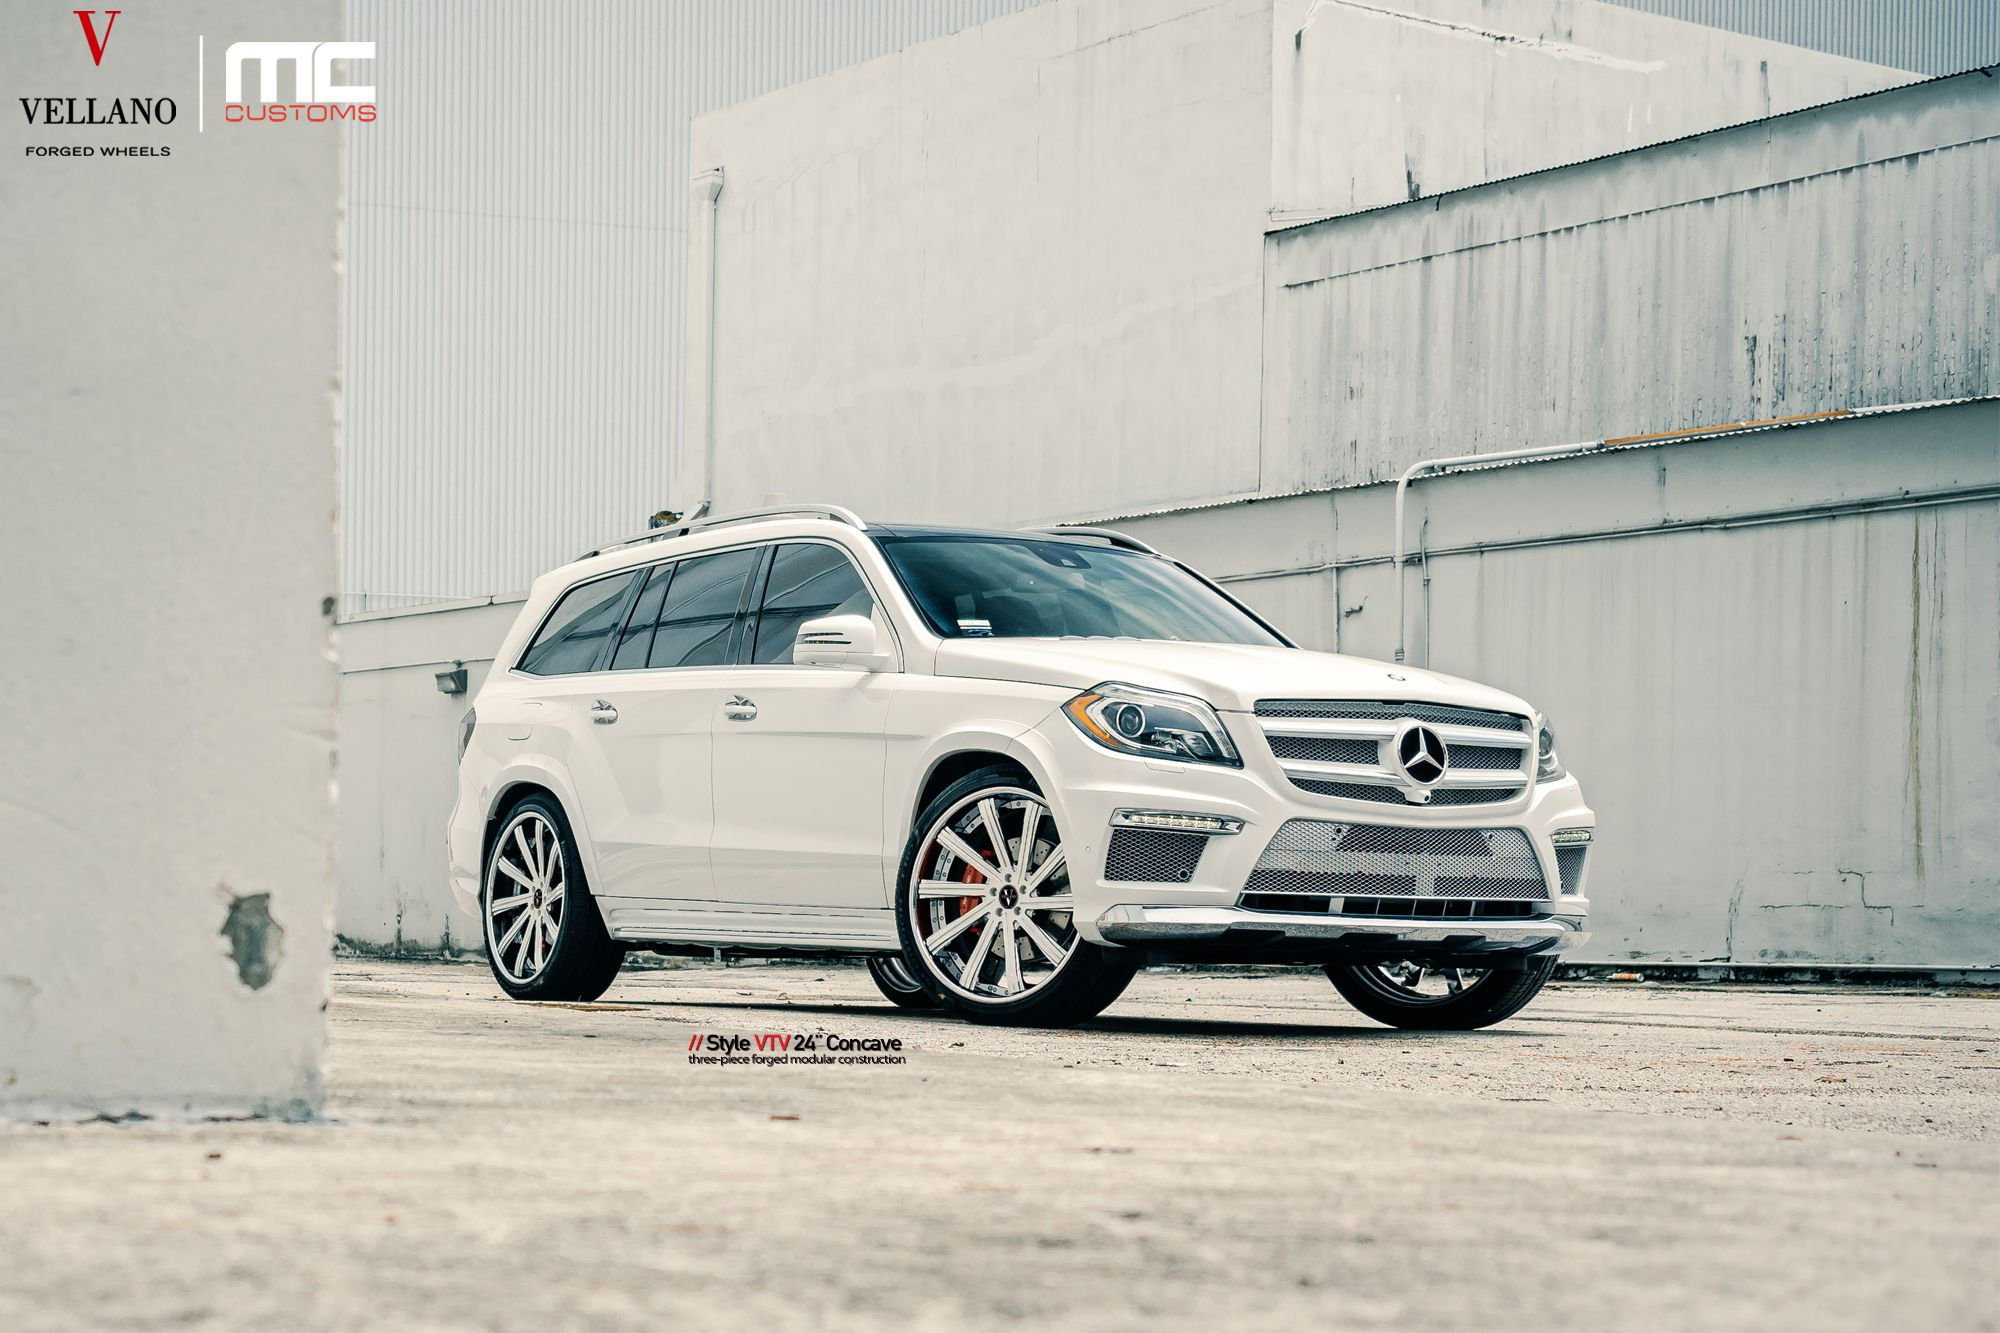 Mercedes benz gl550 rolling on a set of vellano vtv 24 concave